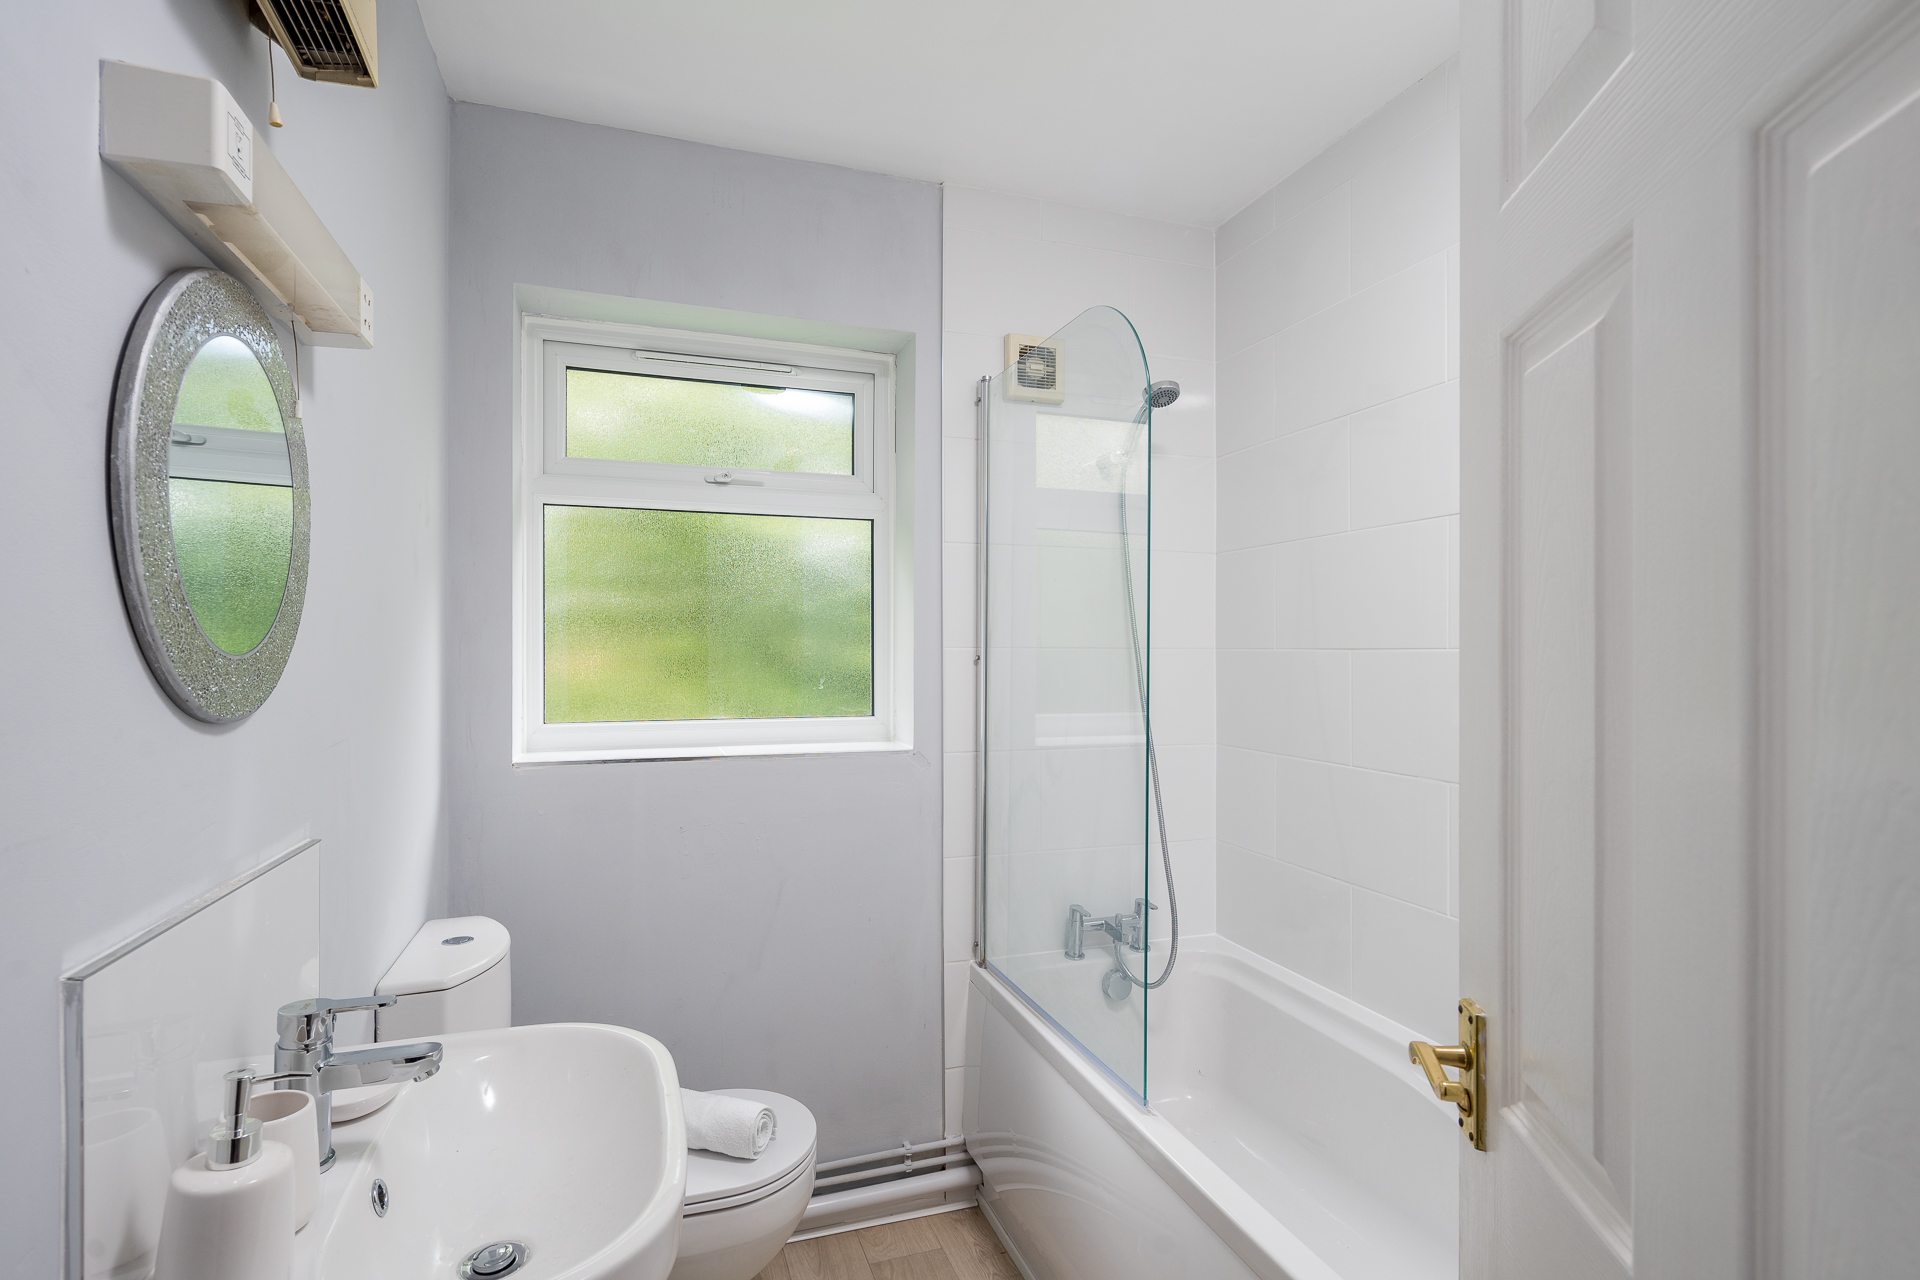 Bathroom at Crawley Centre Apartment, Southgate, Crawley